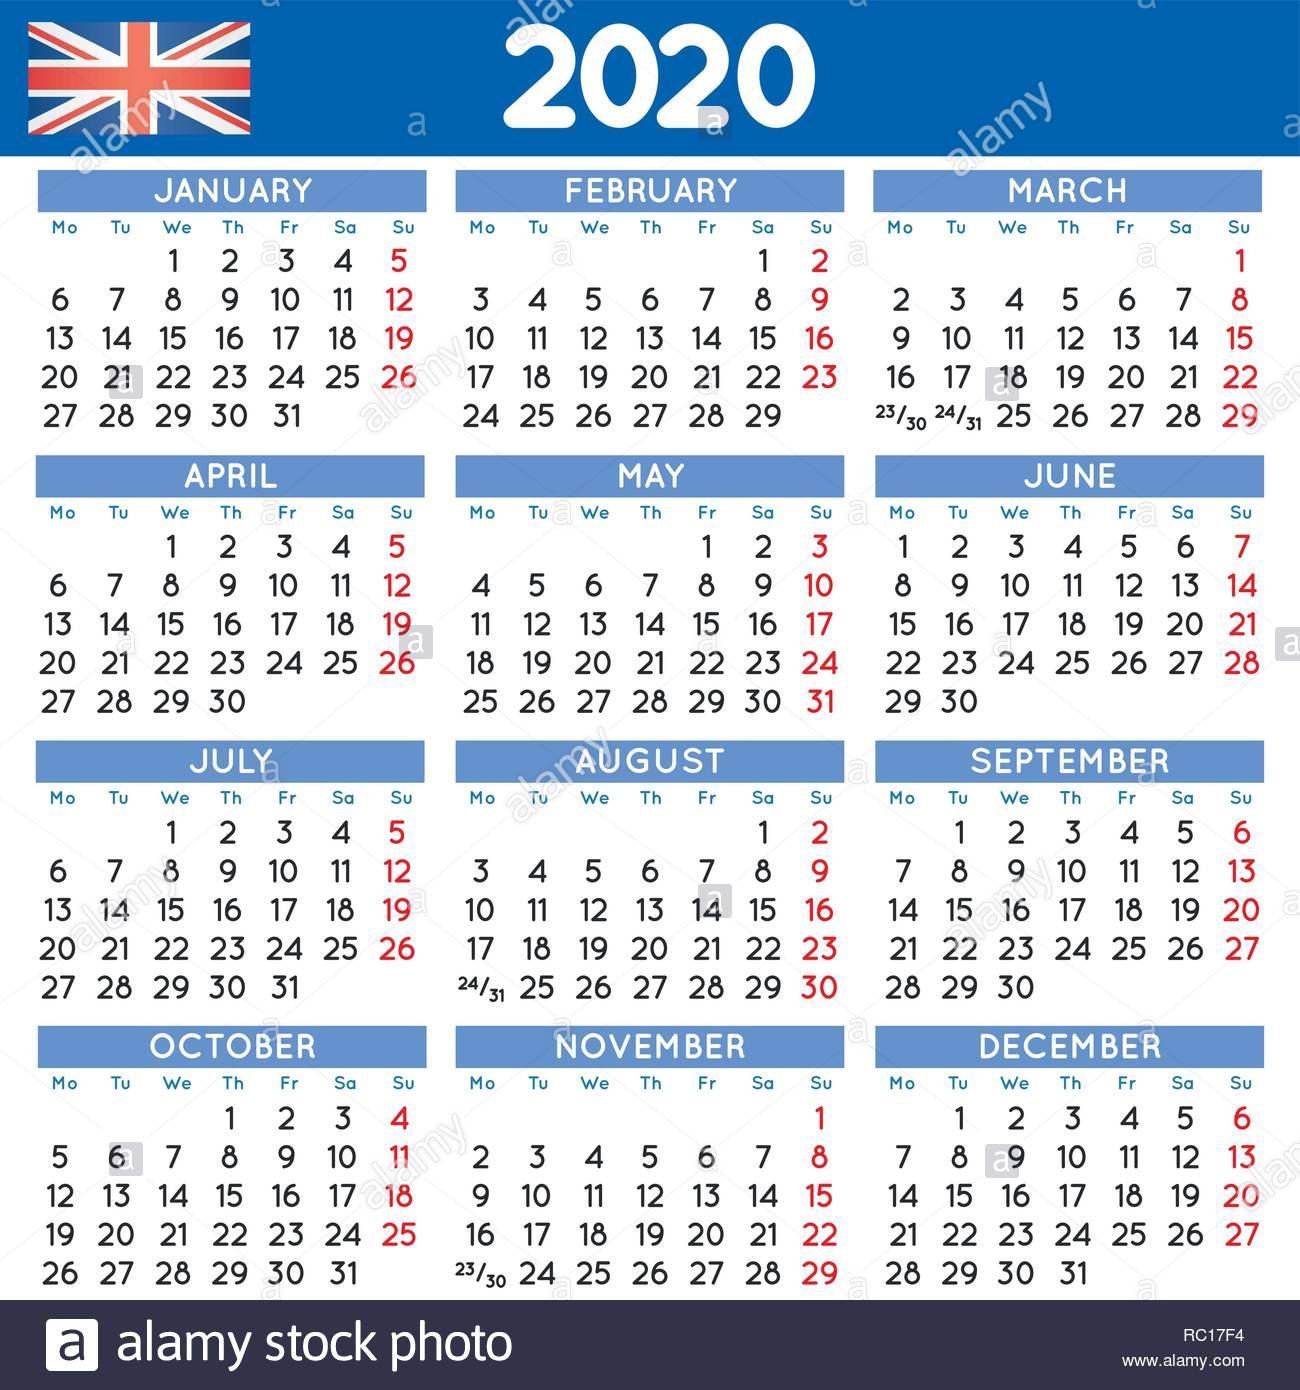 Calendario Anno 2020.2020 Elegante Calendario Squadrato In Inglese Britannico